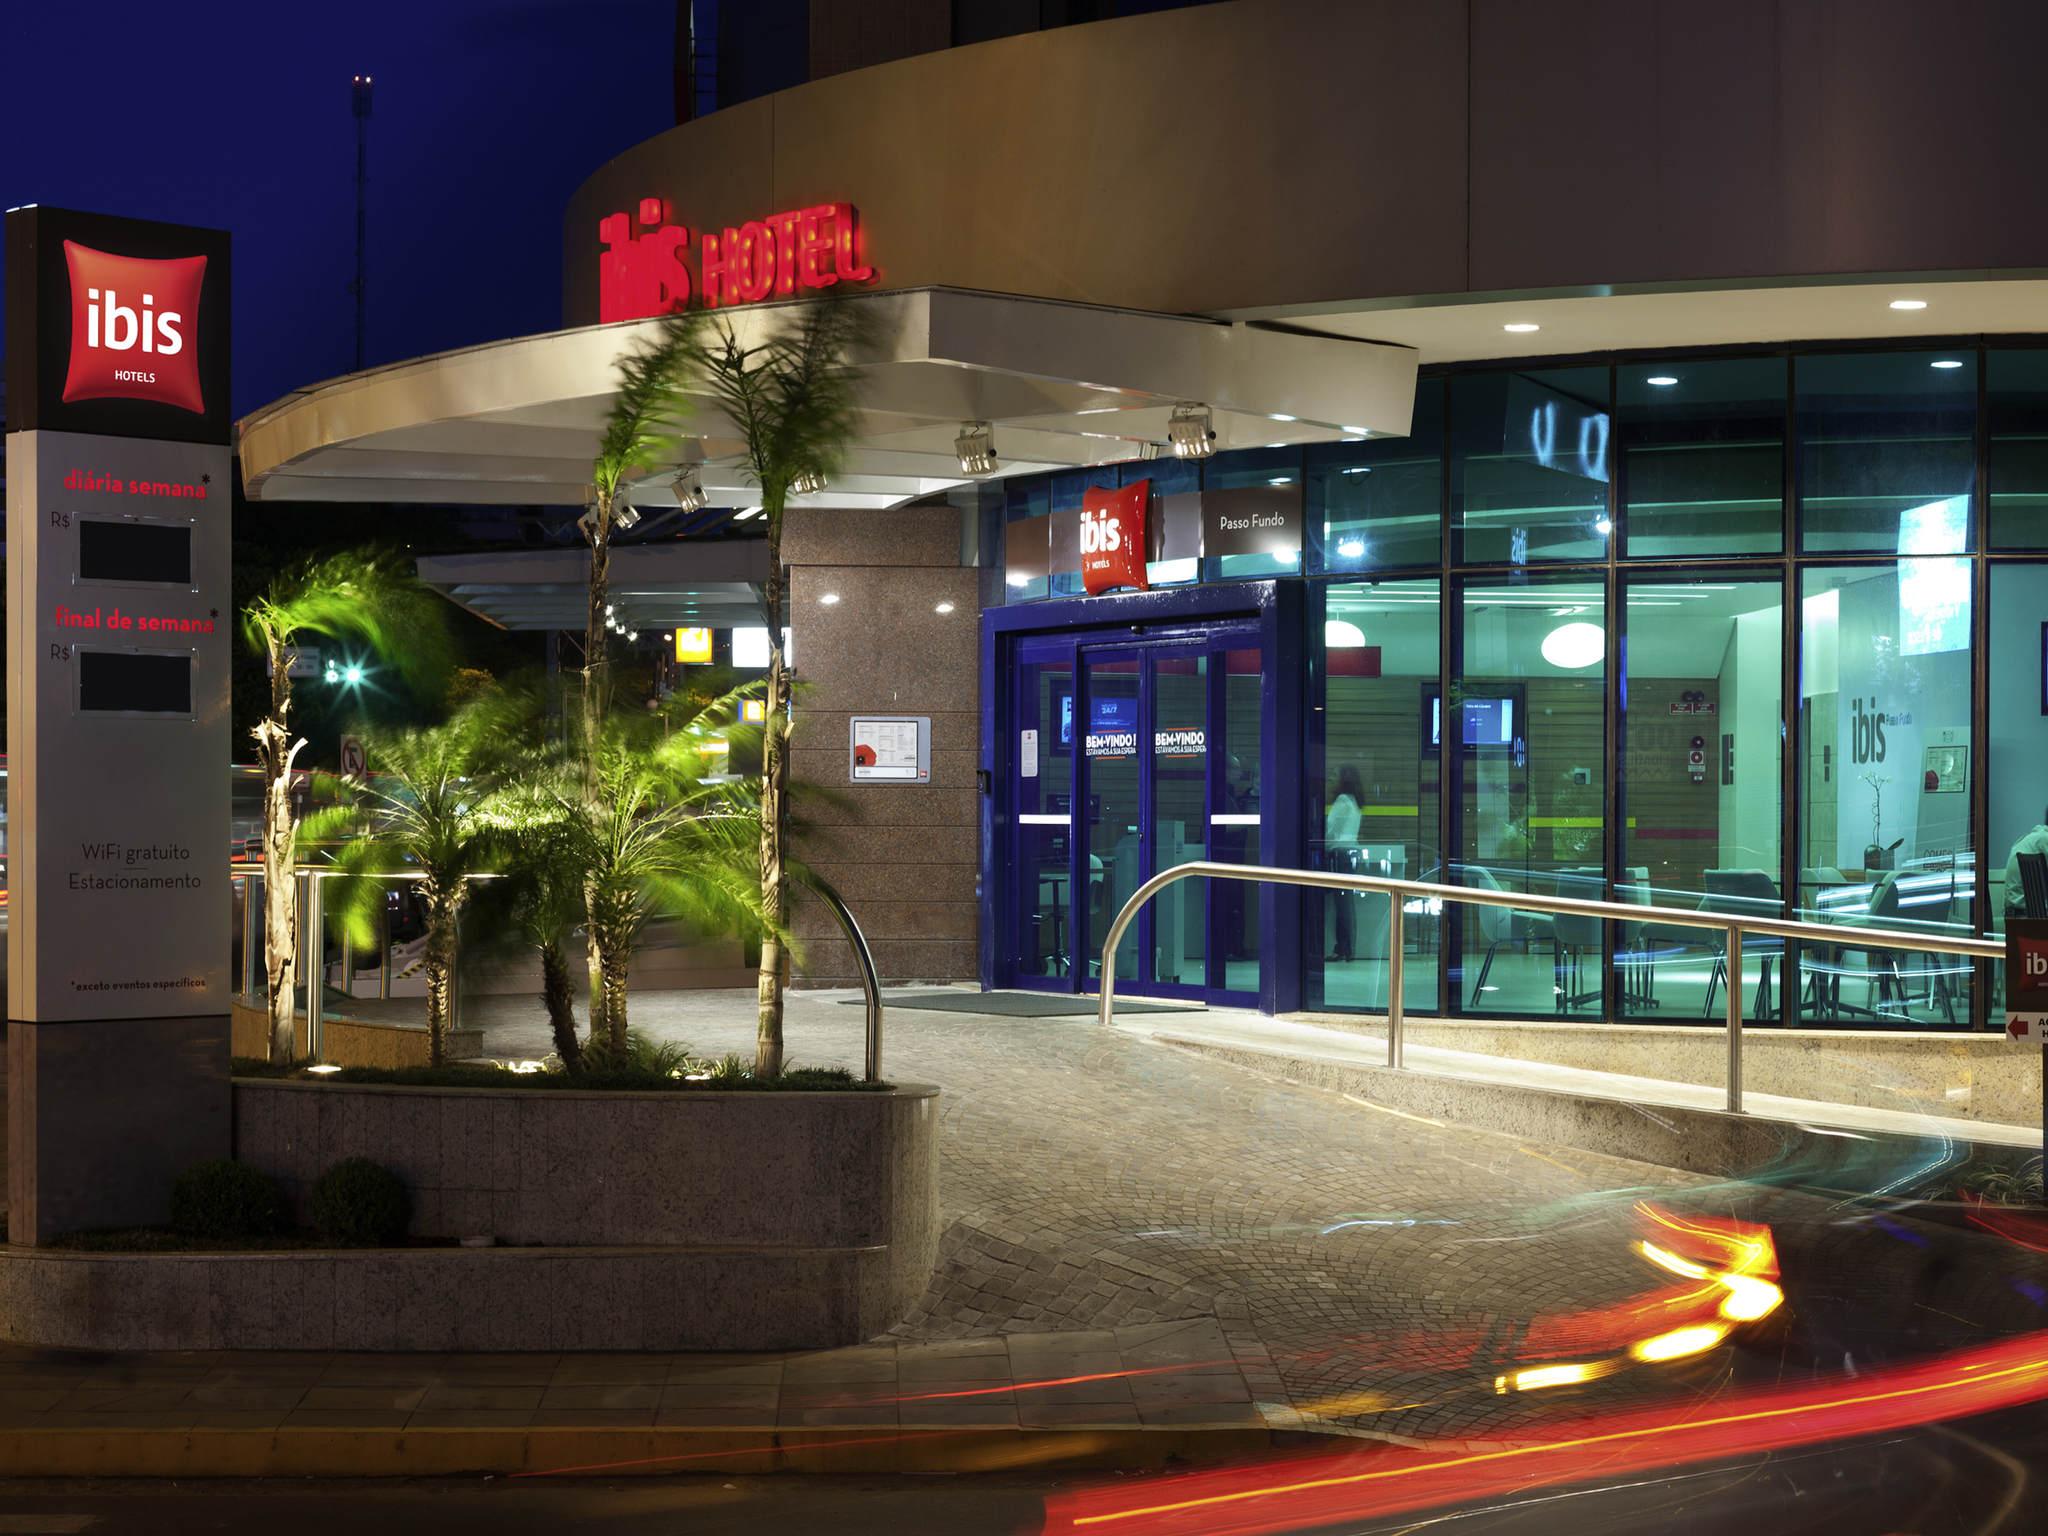 Hotel – ibis Passo Fundo Centro